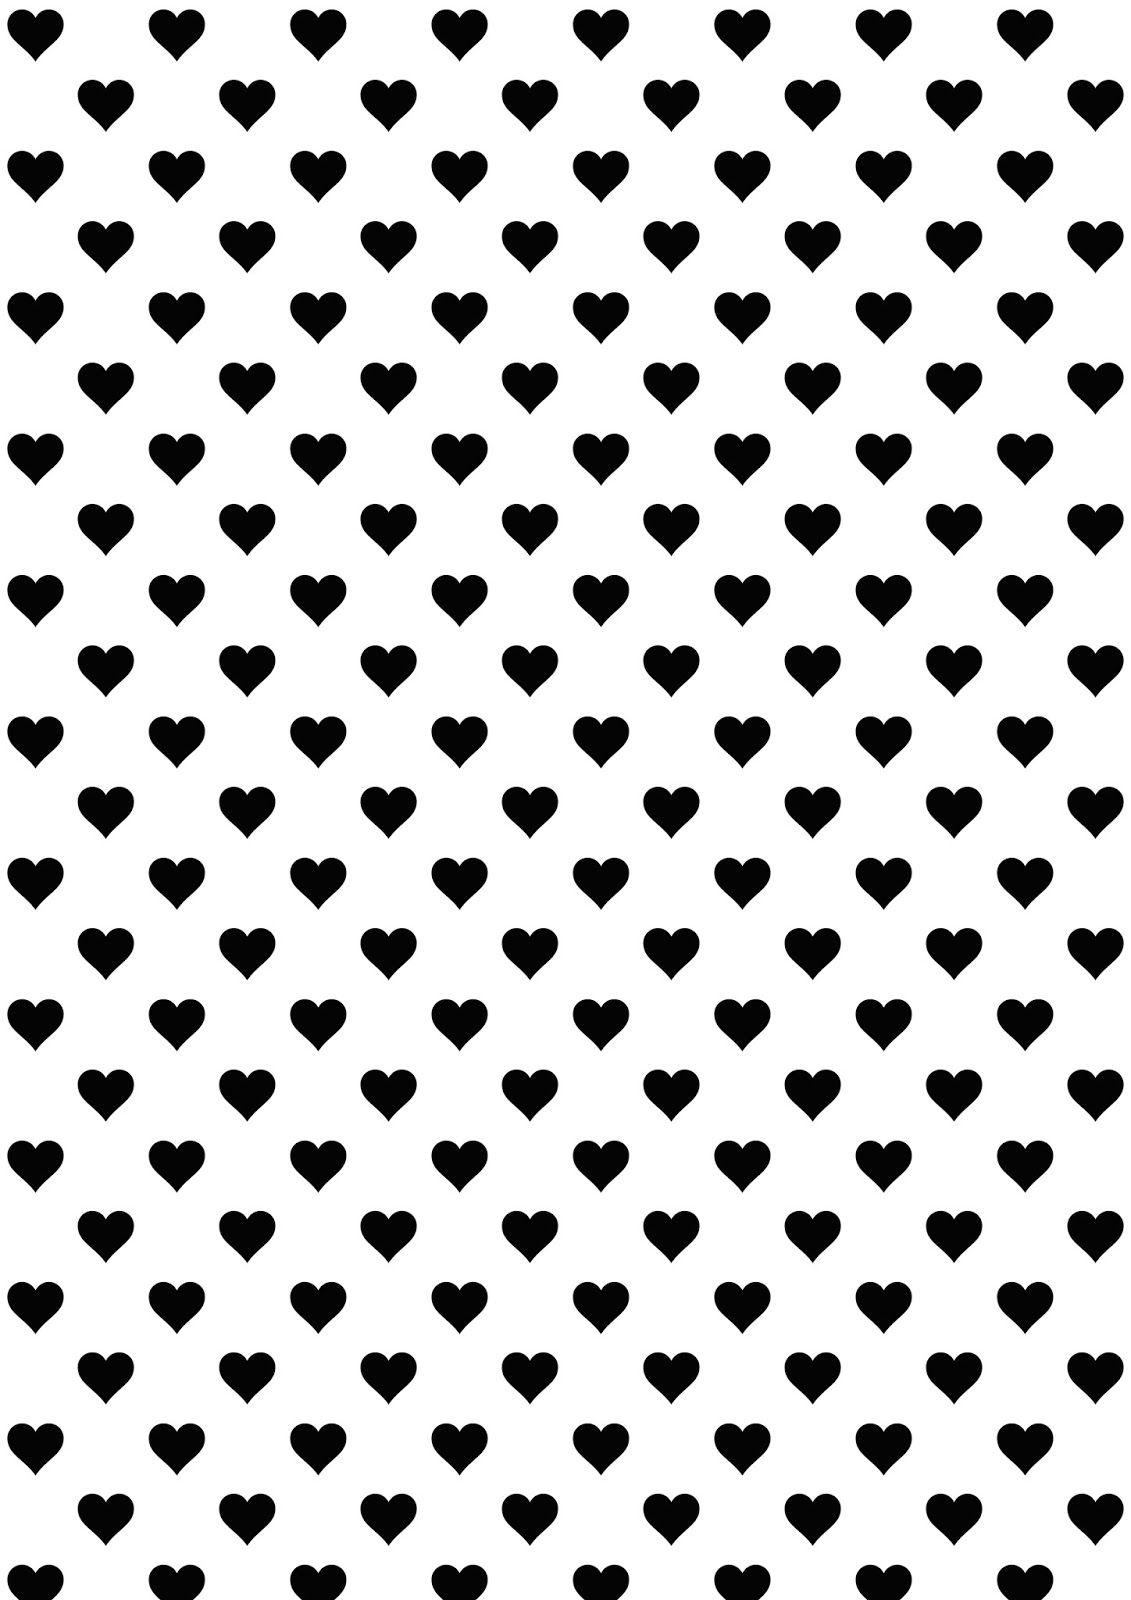 Free Digital Heart Scrapbooking Paper Ausdruckbares Geschenkpapier